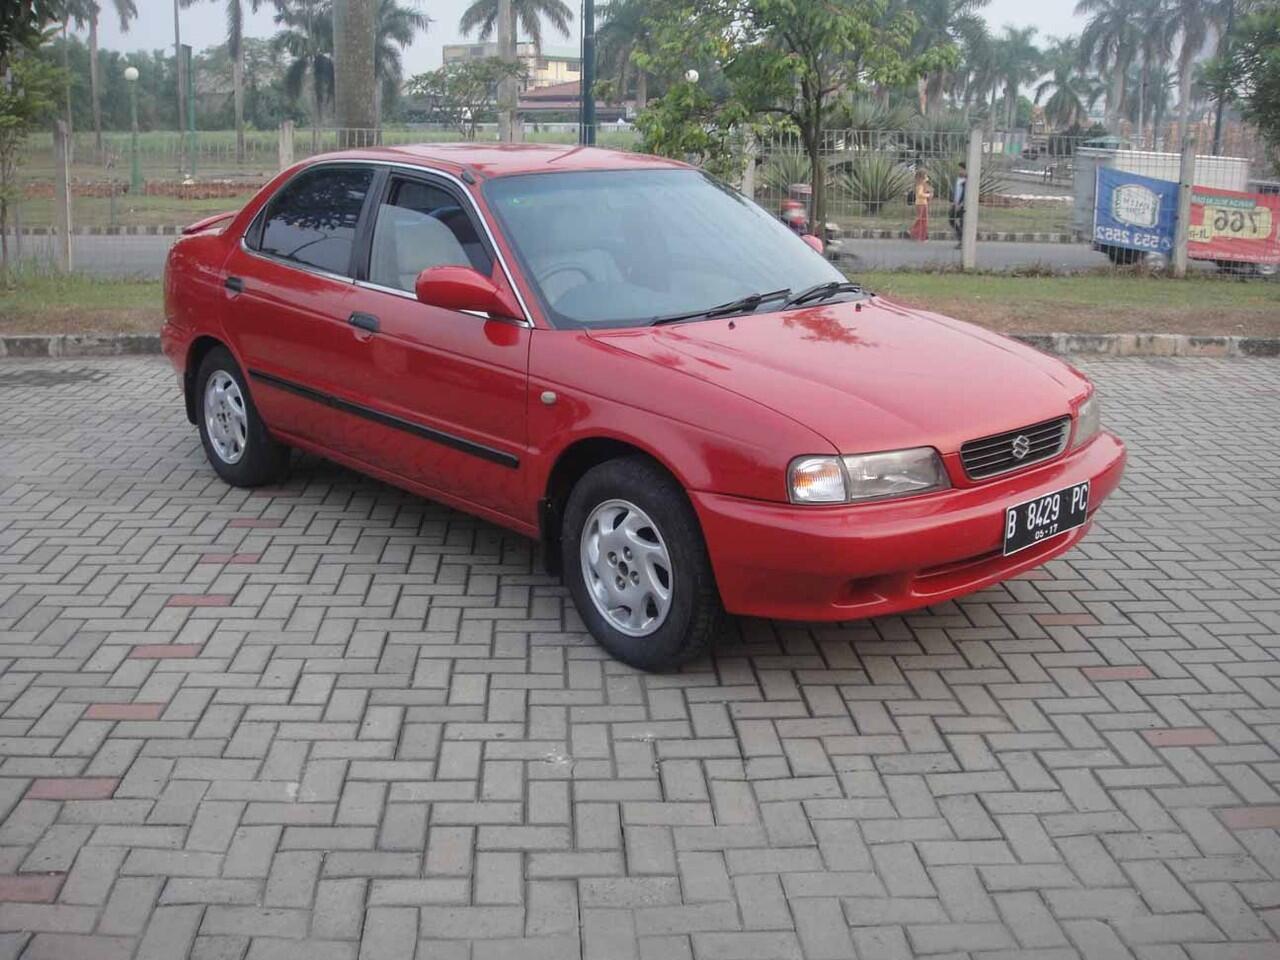 Suzuki Baleno th 1999, merah, nego langsung di 08129485373 - 02198057789